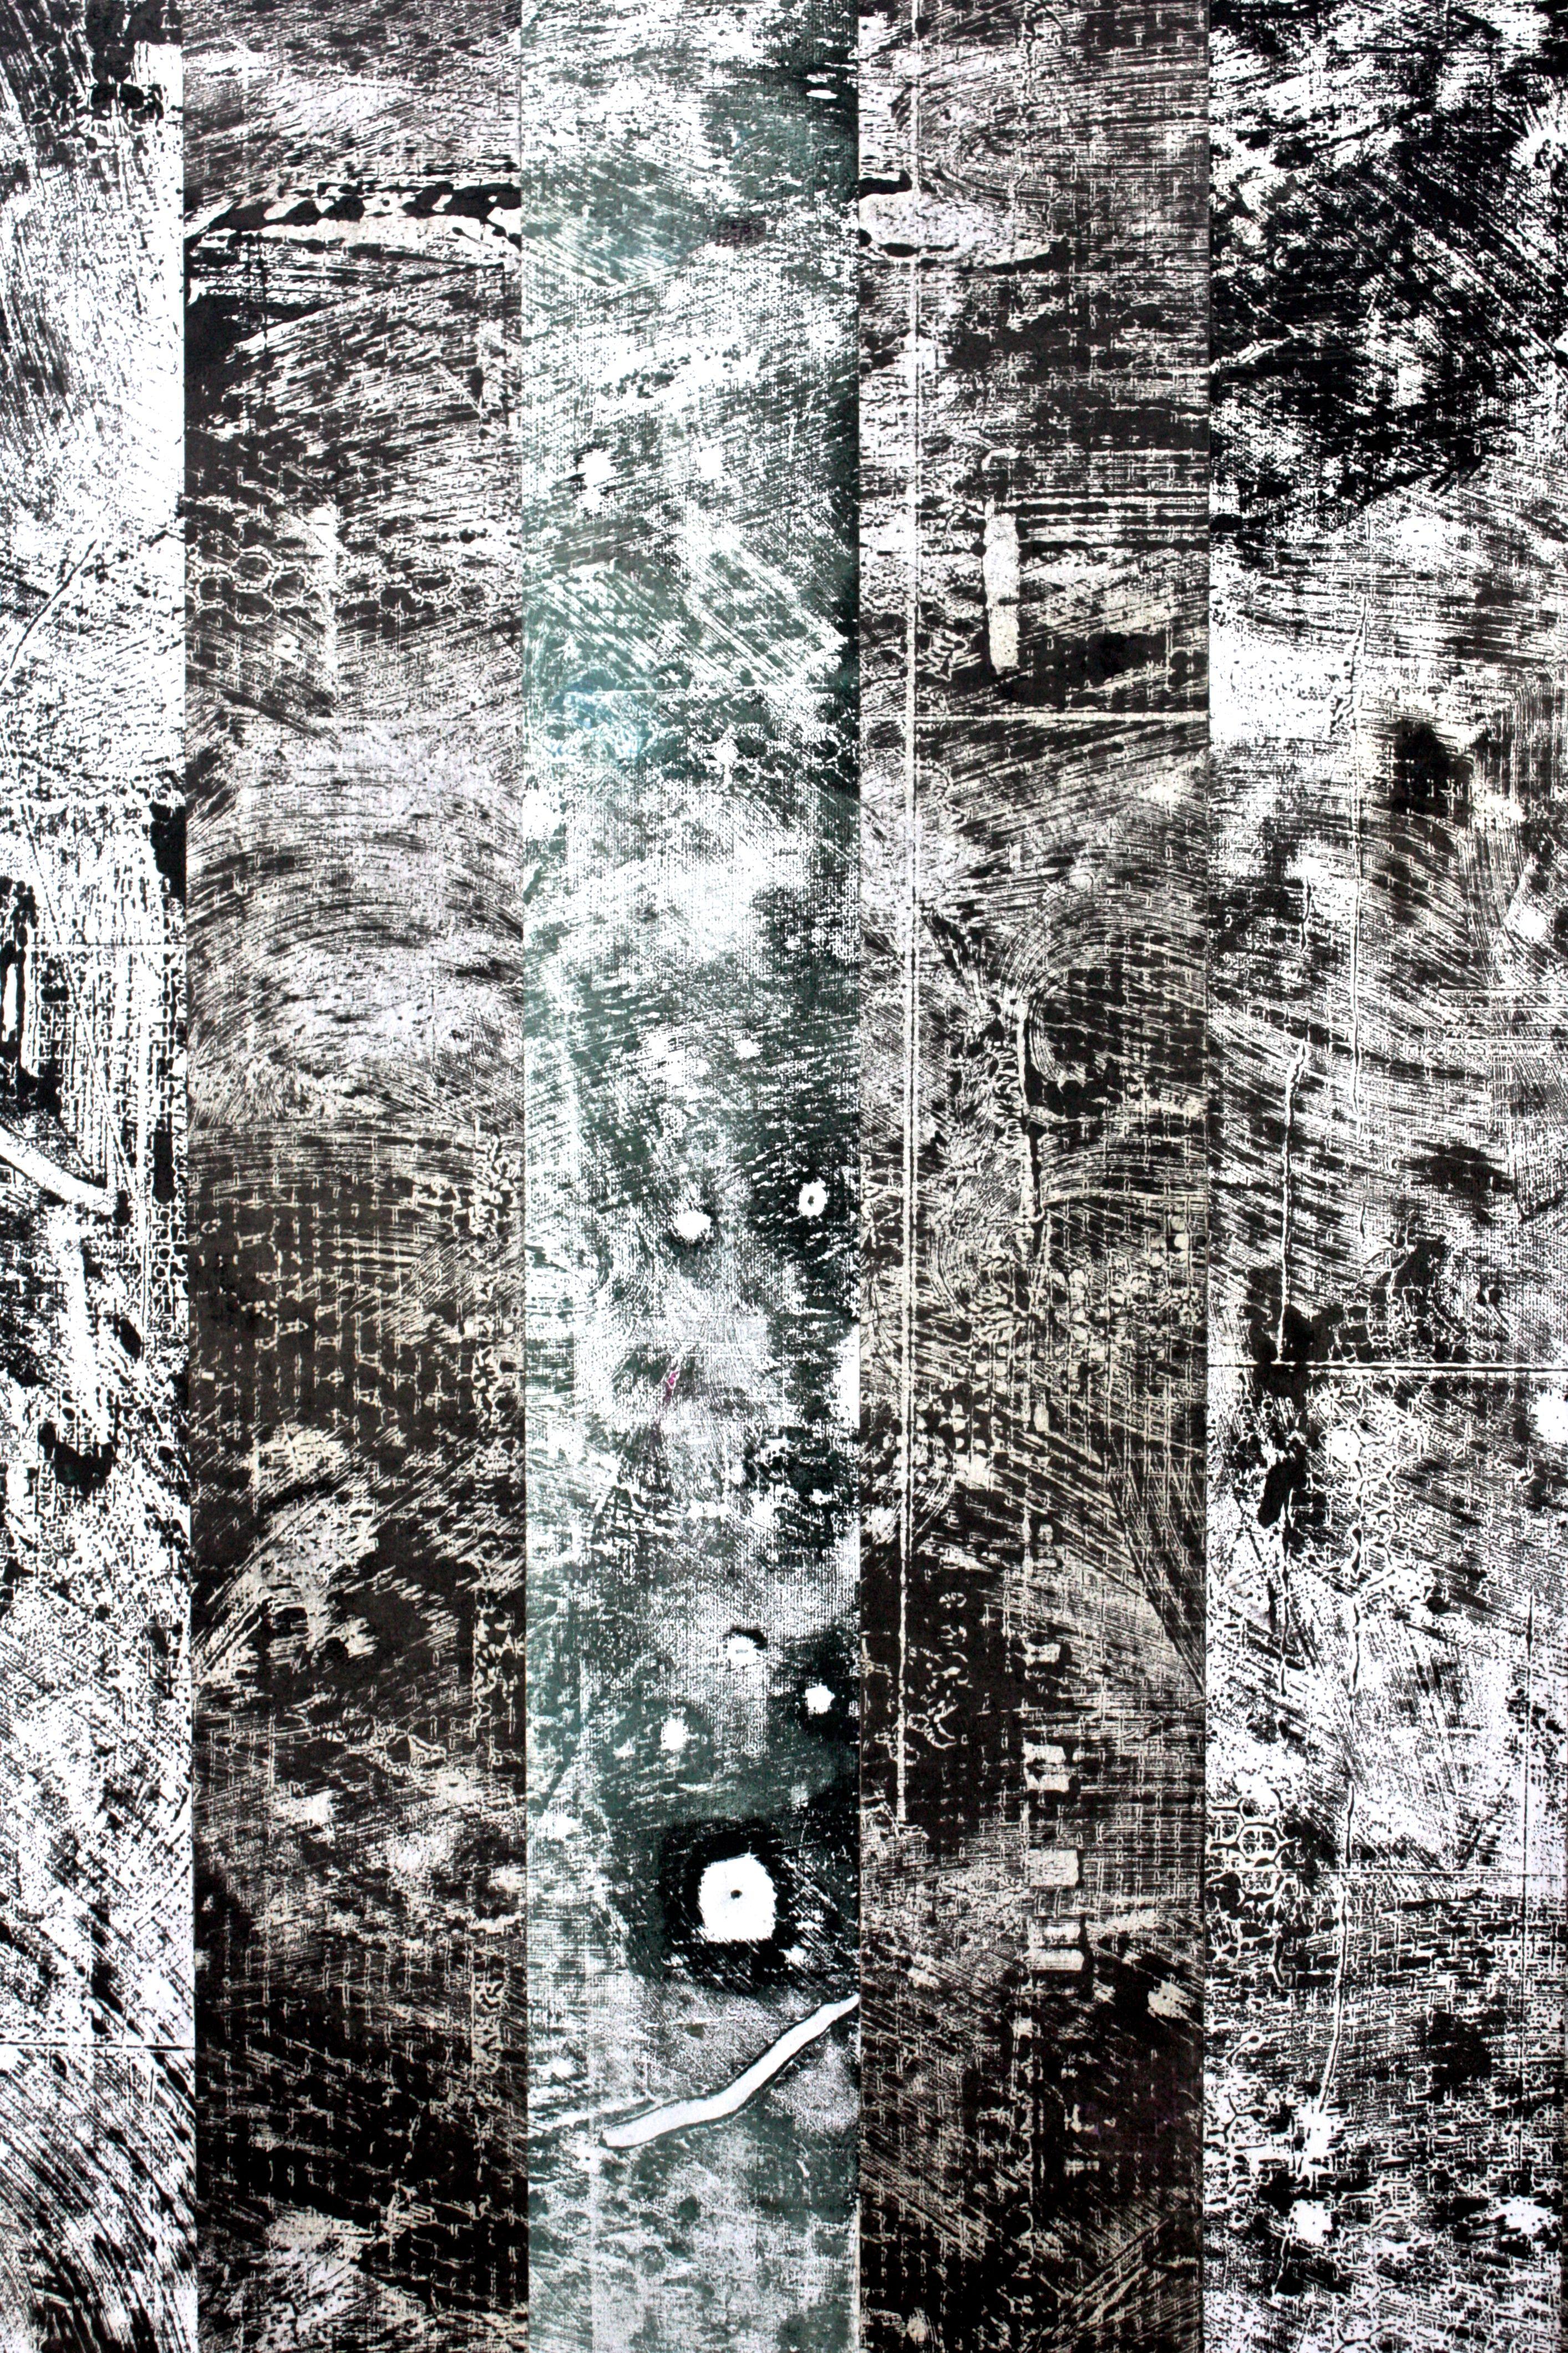 Detail Archeo-Metria Delle Resistenze #3, #FrancescoIrnem #Canal05 #Brusseles #Artgallery